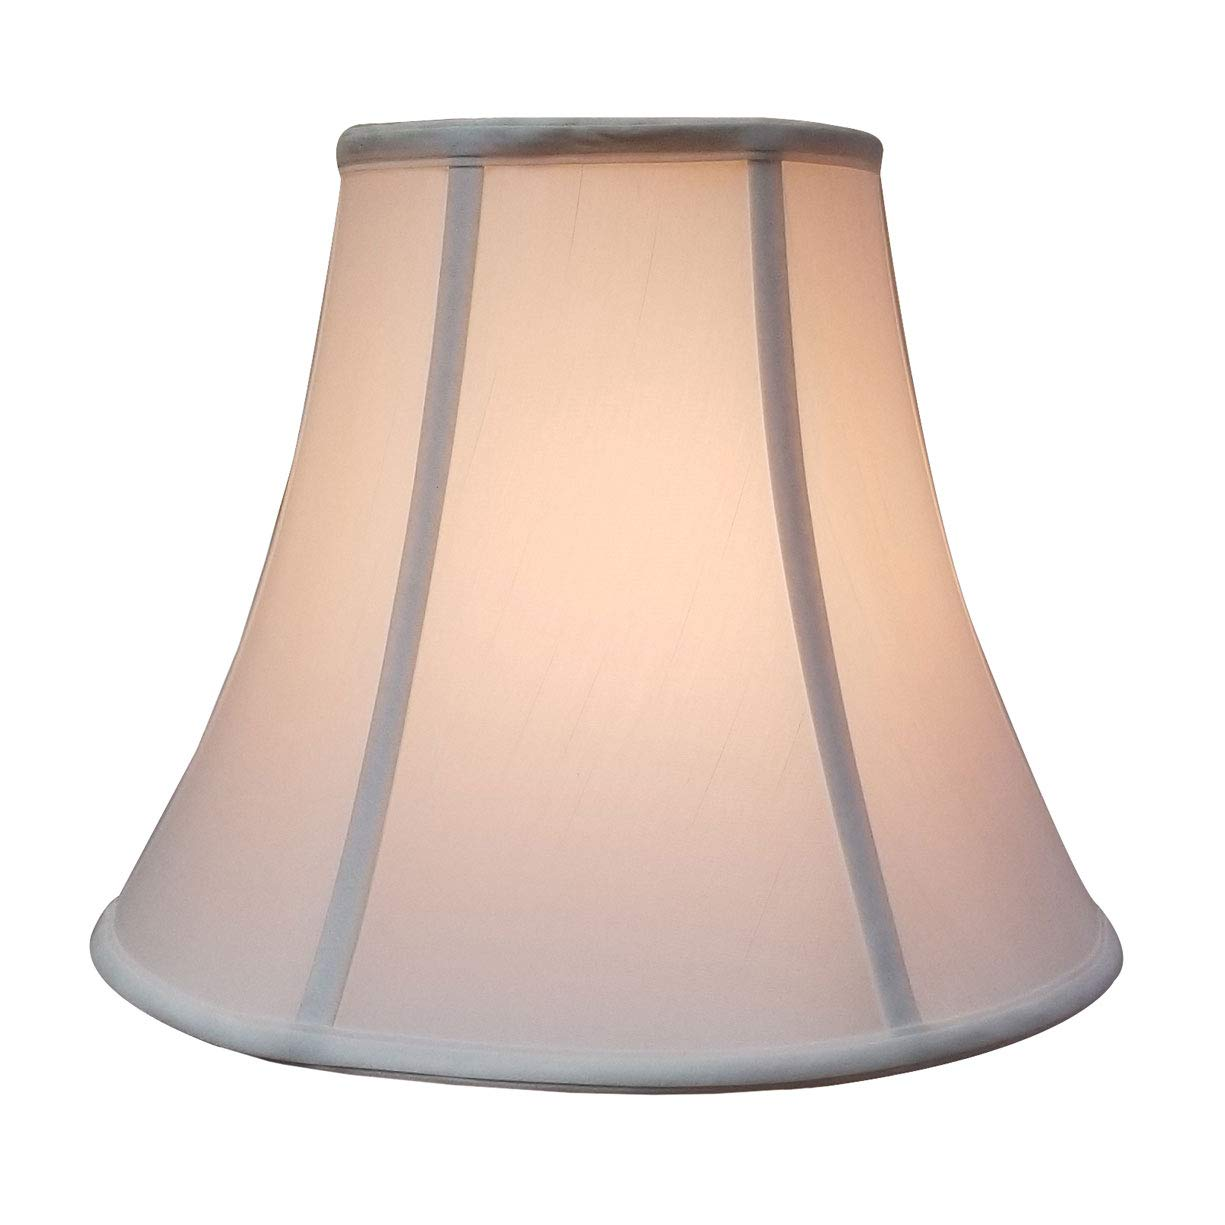 Amazon.com: Royal Designs - Pantalla para lámpara de techo ...